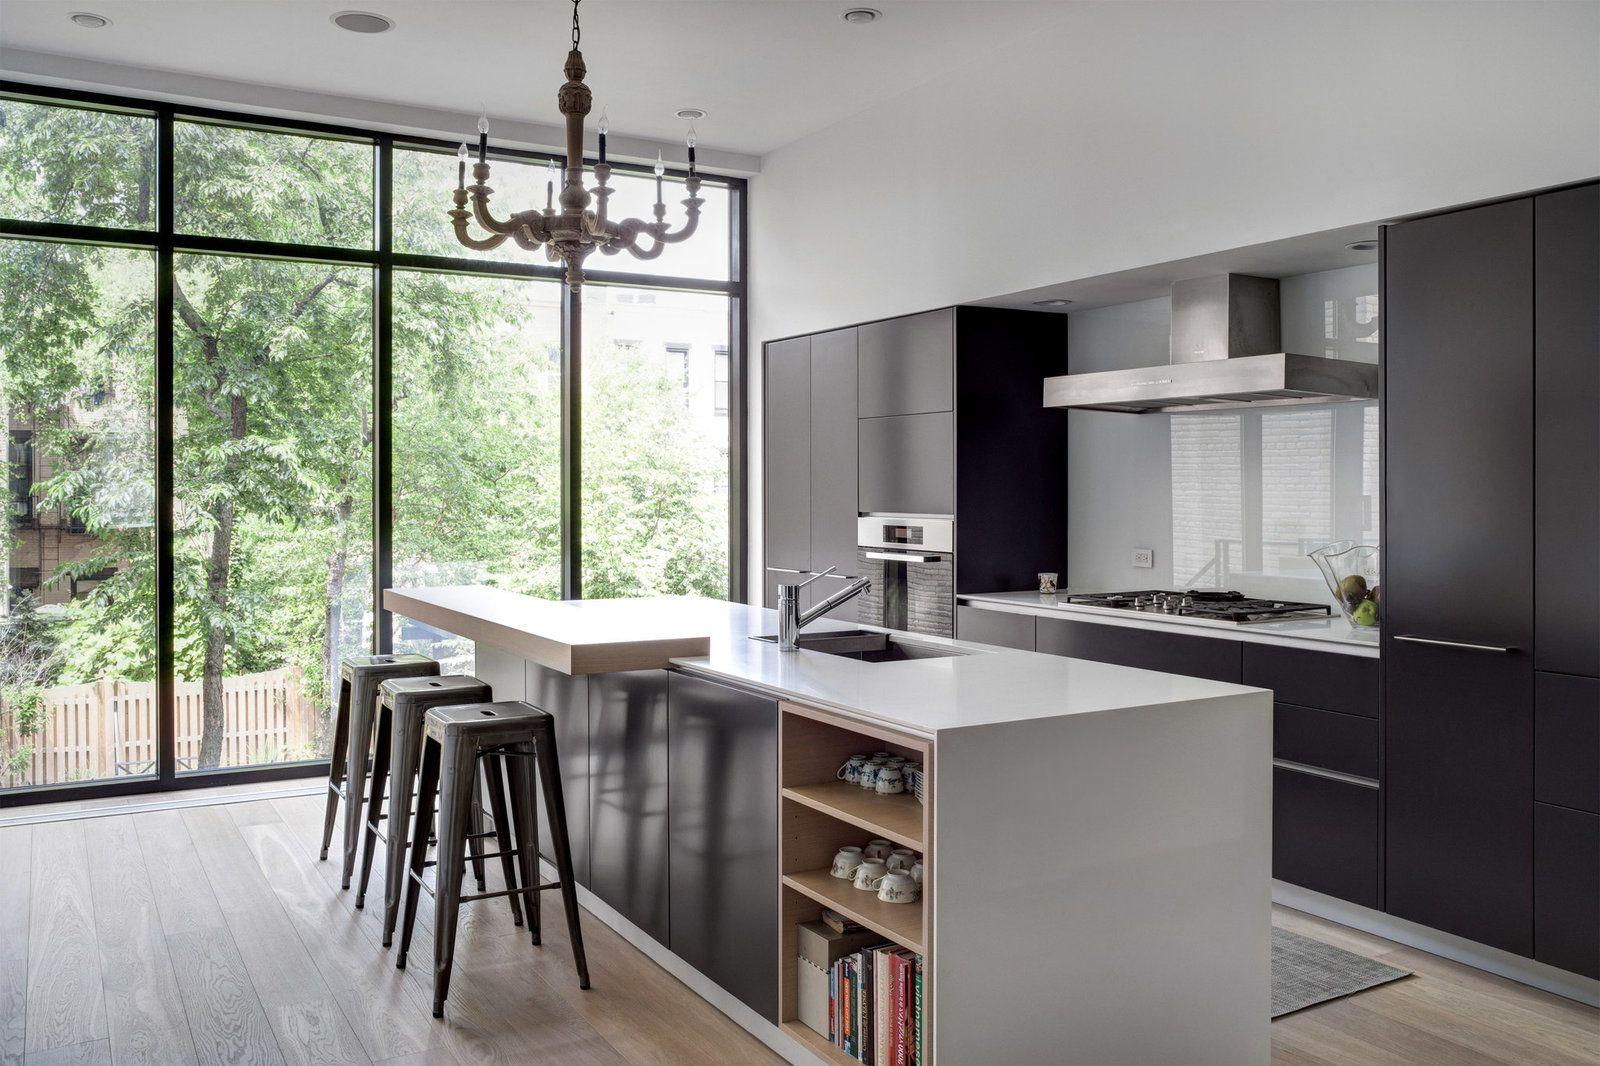 brownstone gut renovation and conversion hoboken nj roomreveal rh in pinterest com